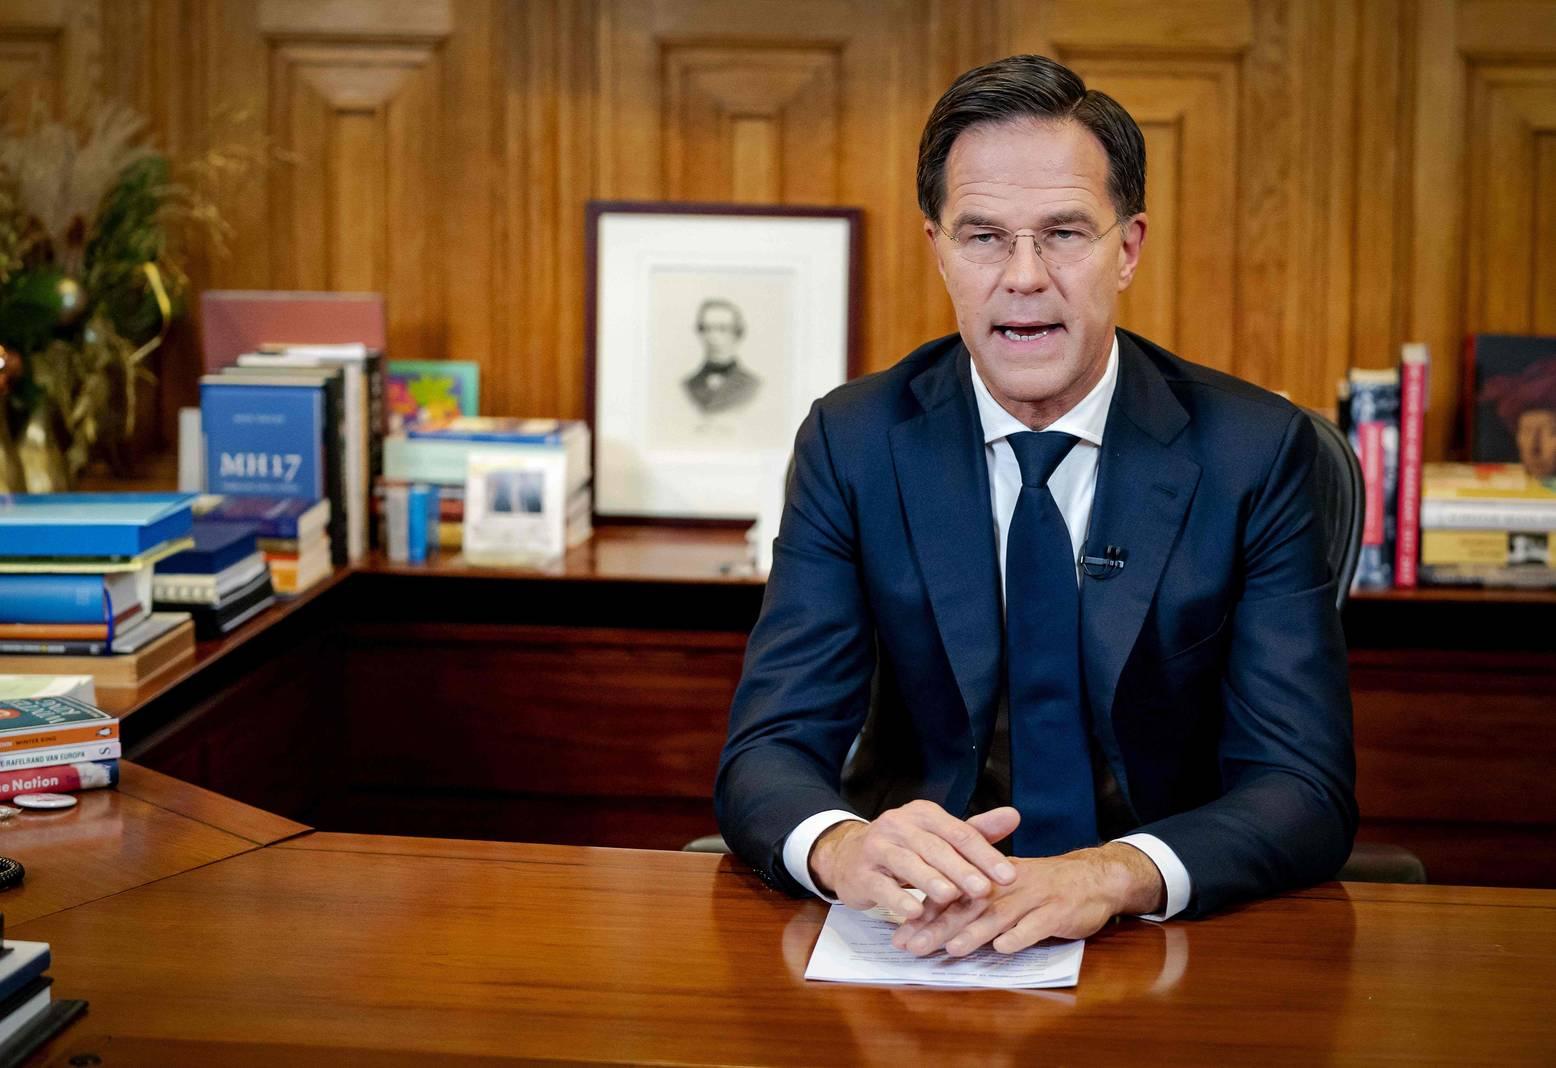 corona in holland: auch niederlande gehen in strengen